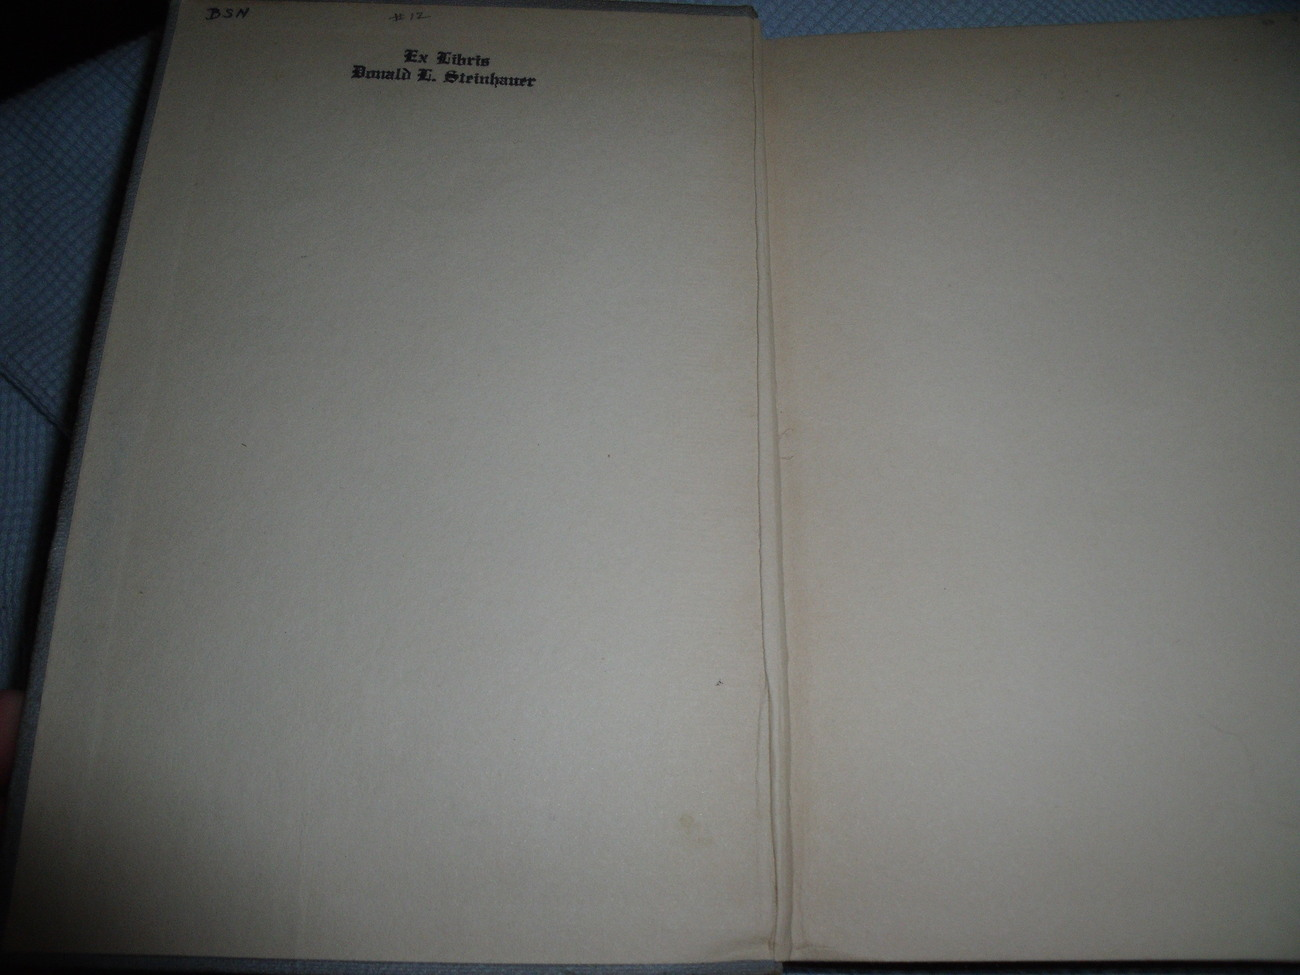 Lego Lamb, Southpaw By Burt L. Standish first edition 1923